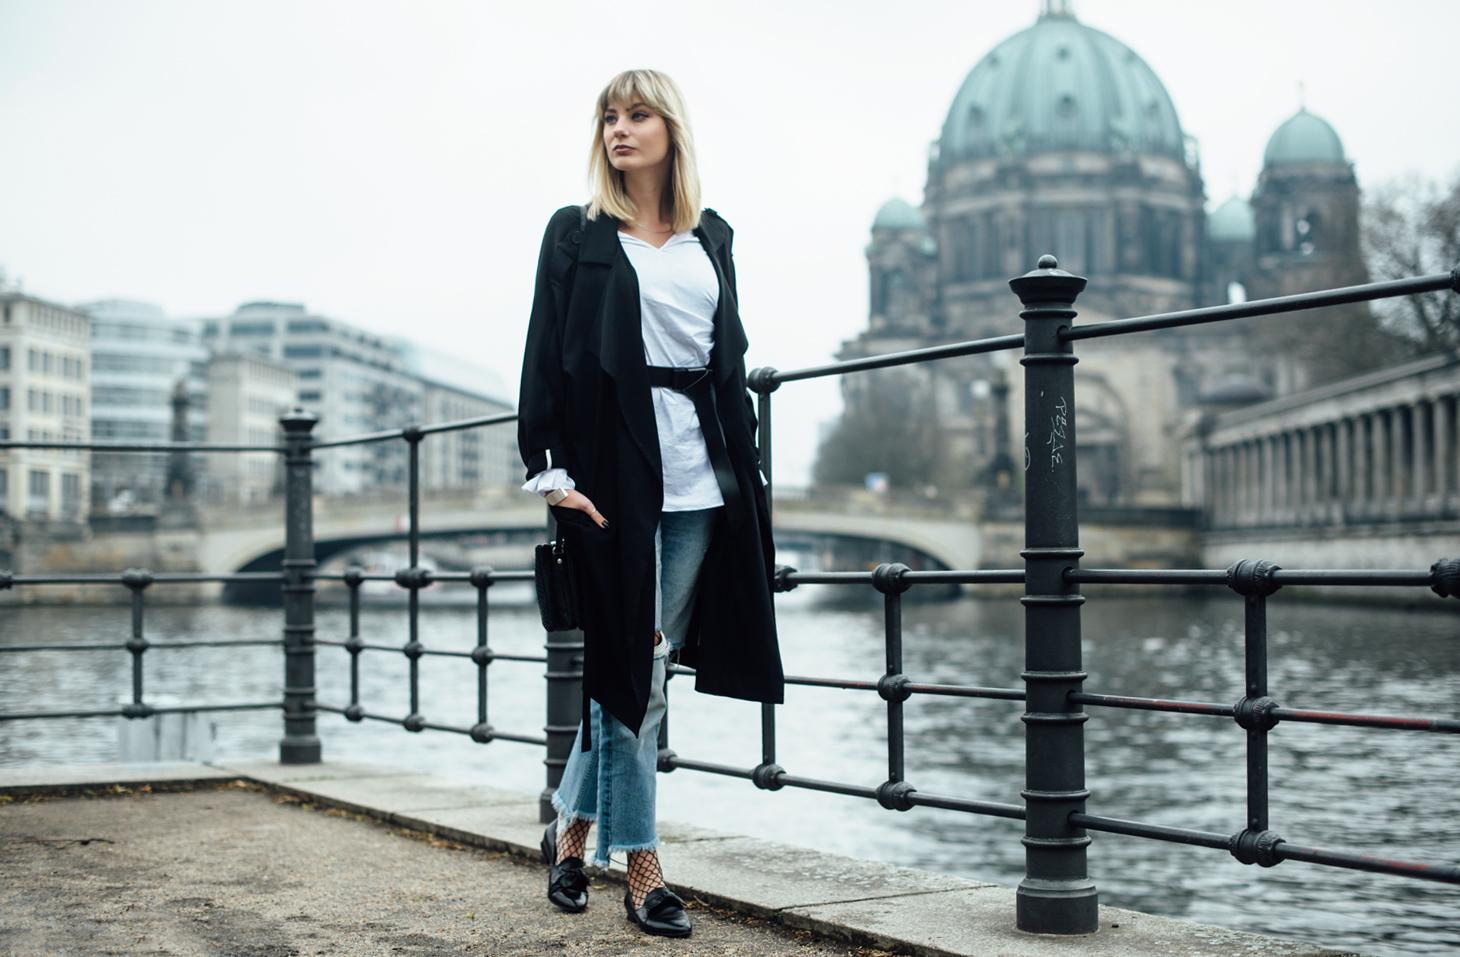 Netzstrumpfhose kombinieren_Netzstrumpfhose mit Jeans kombinieren_Netz stylen_Netzsocken stylen_Kiamisu_Modeblog-Final 1